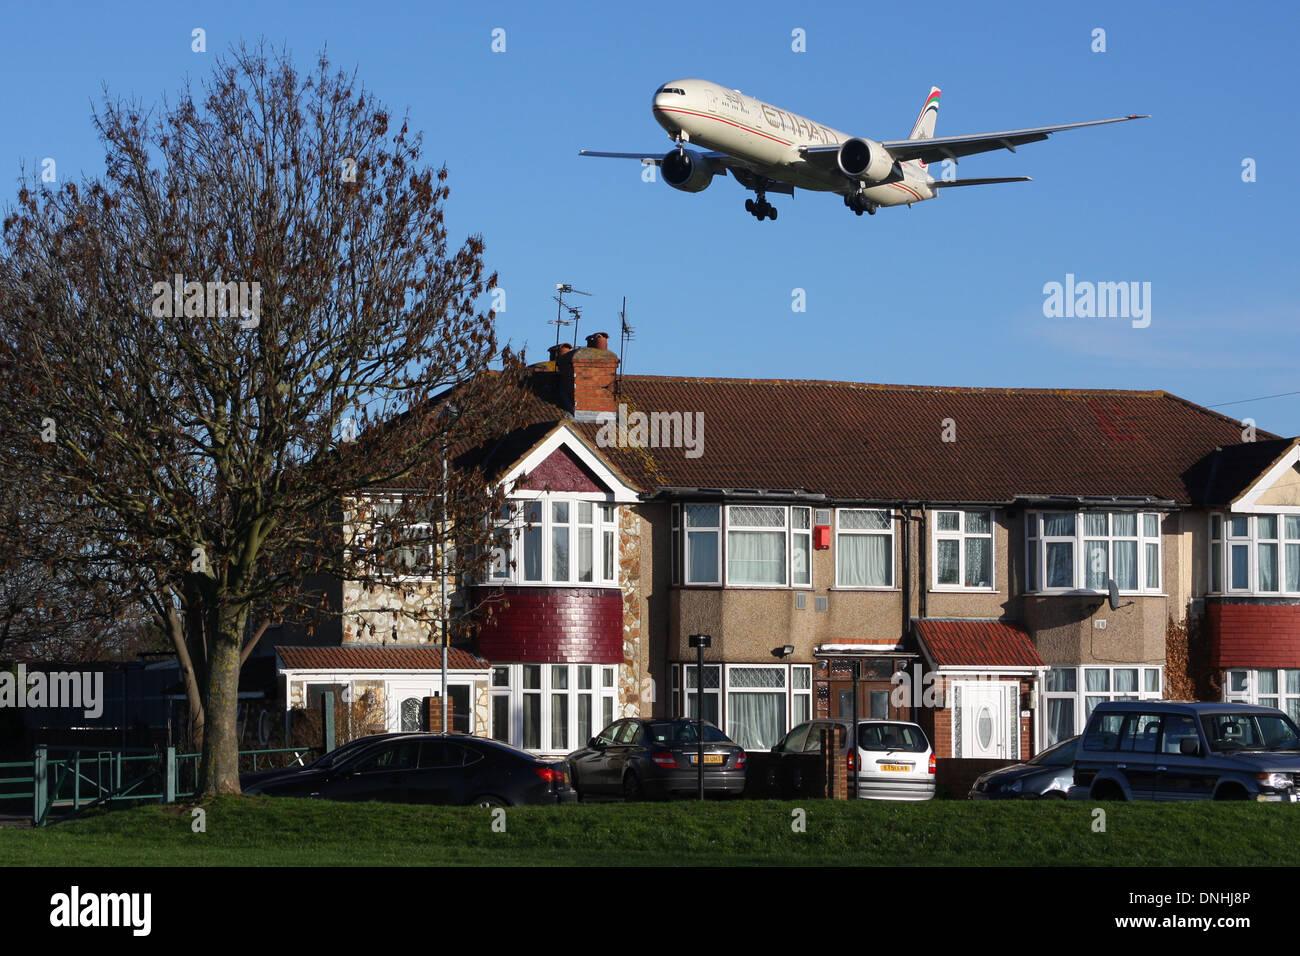 HOUSE PLANE AIRCRAFT NOISE - Stock Image